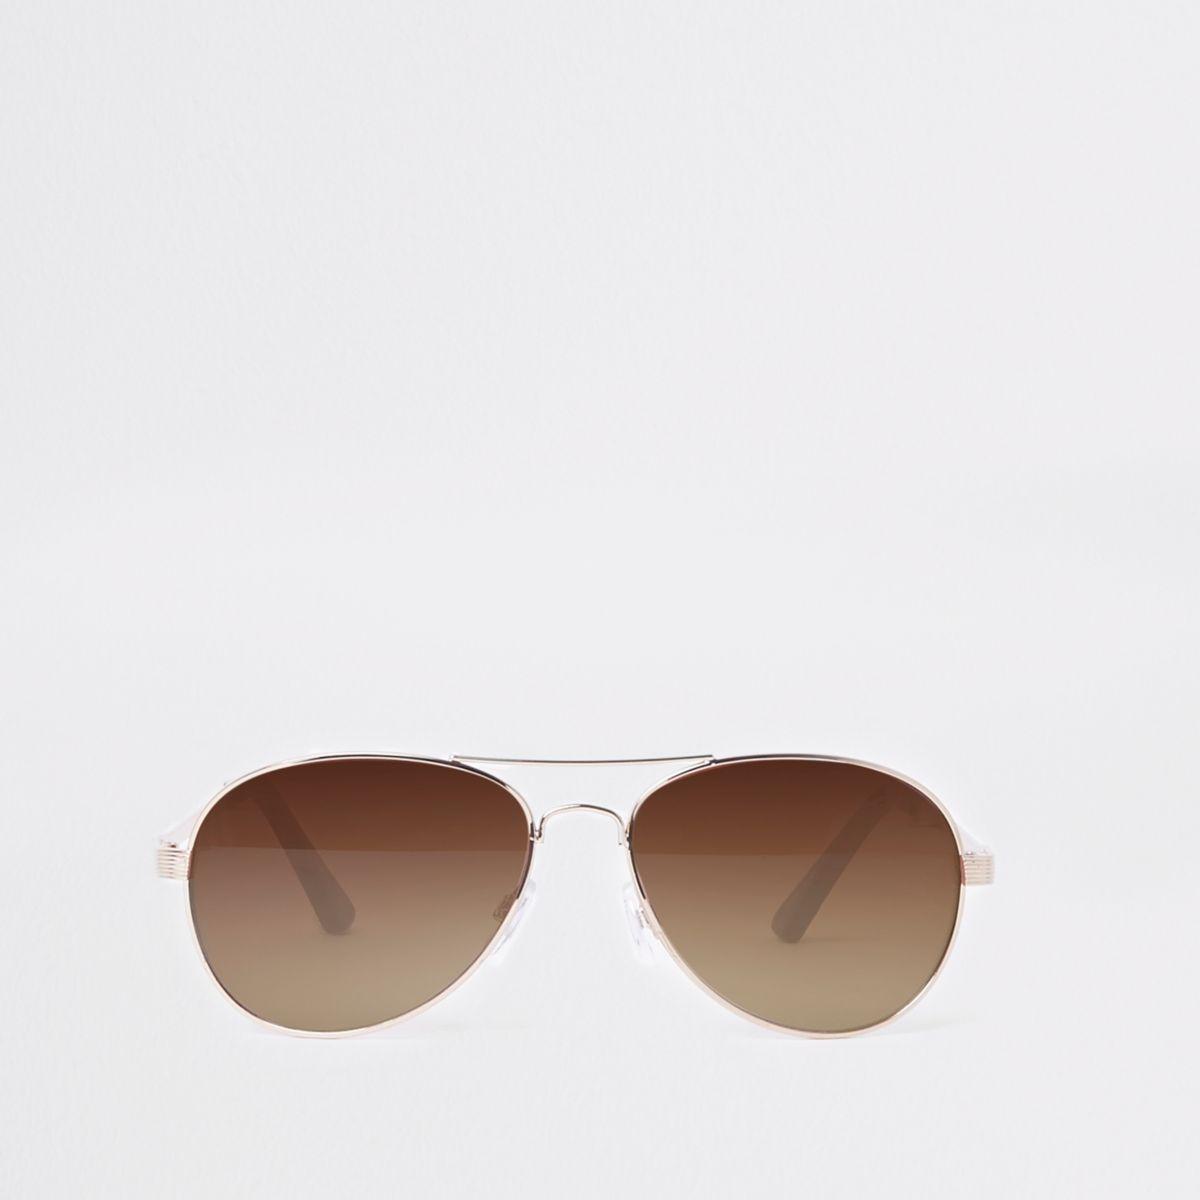 Goudkleurige pilotenzonnebril met bruine glazen